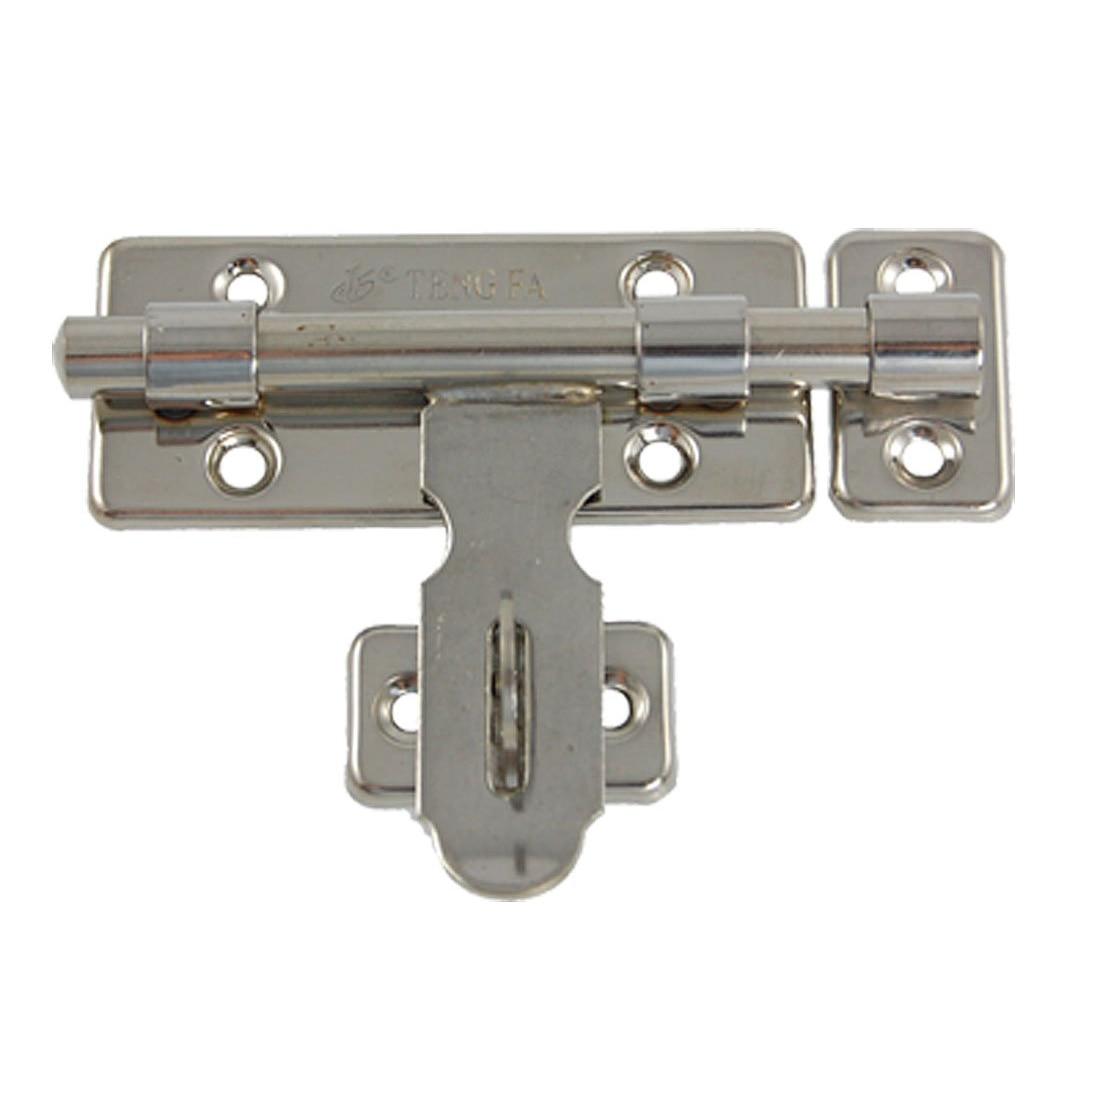 door doors color key stainless security design lock locks safe satin nickel room locker classic with item steel